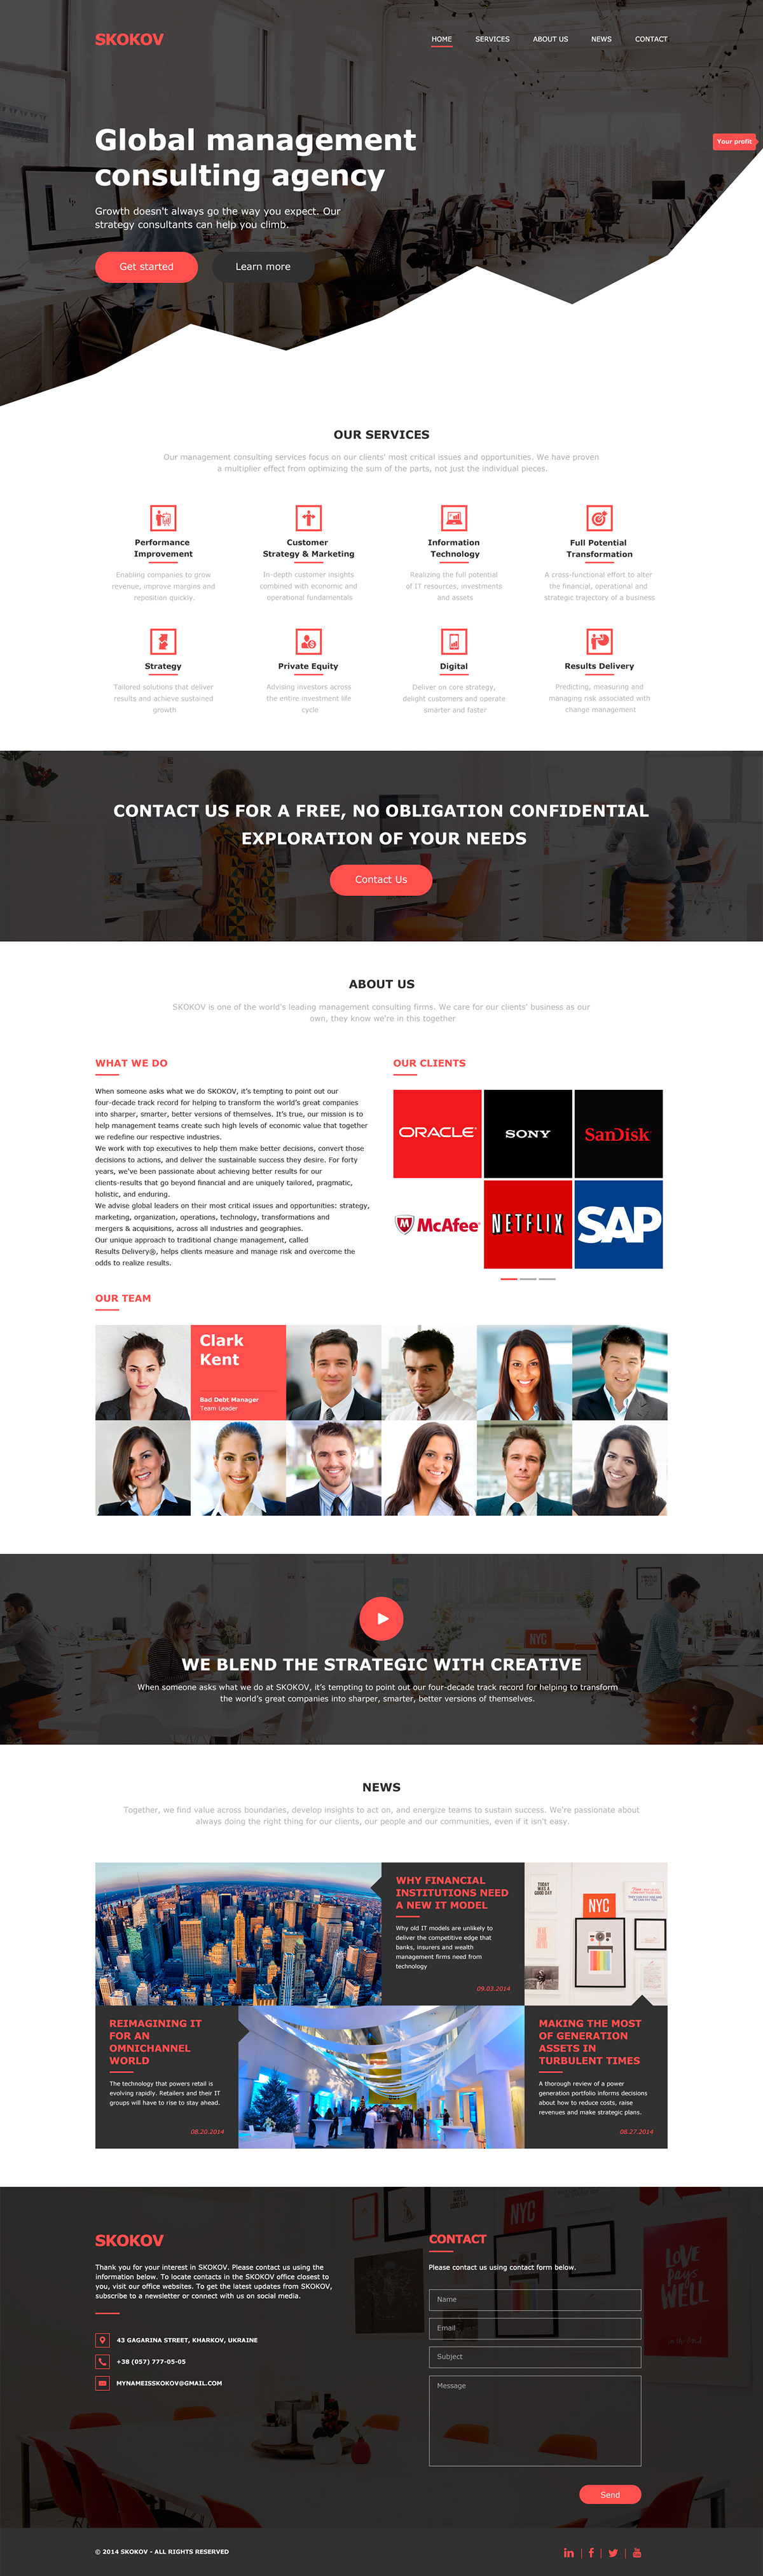 Webdesign design freebies free download business template psd template free psd